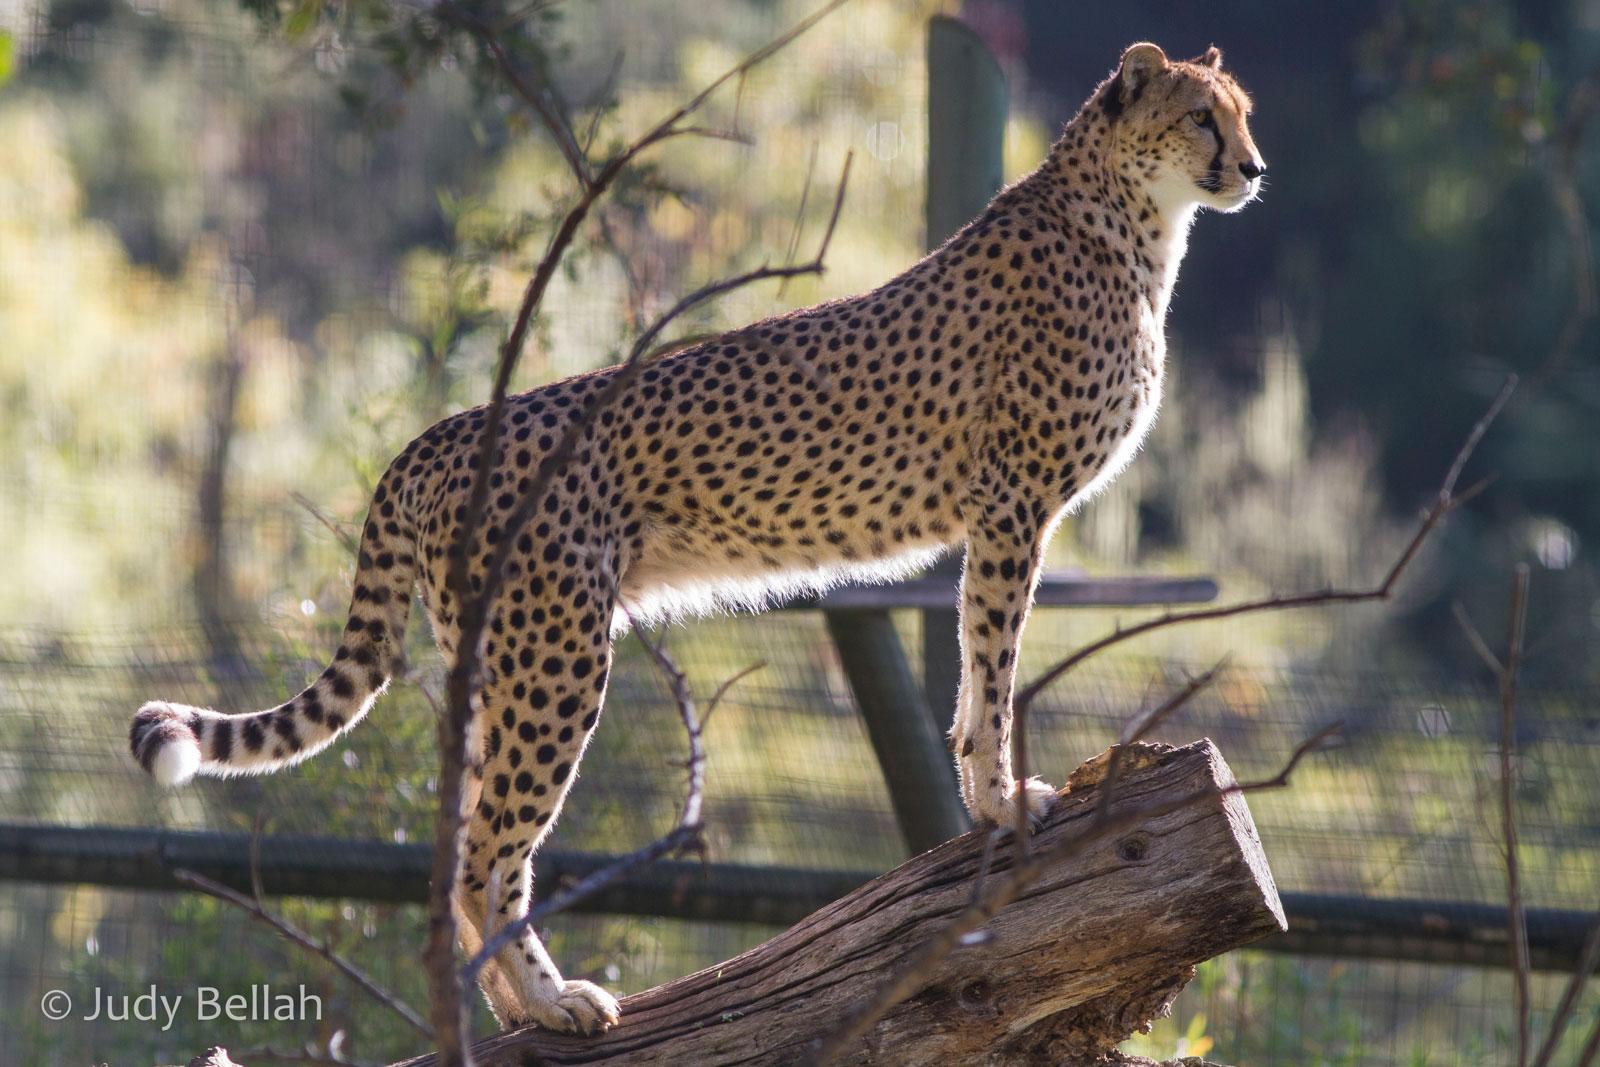 Adopt the cheetah